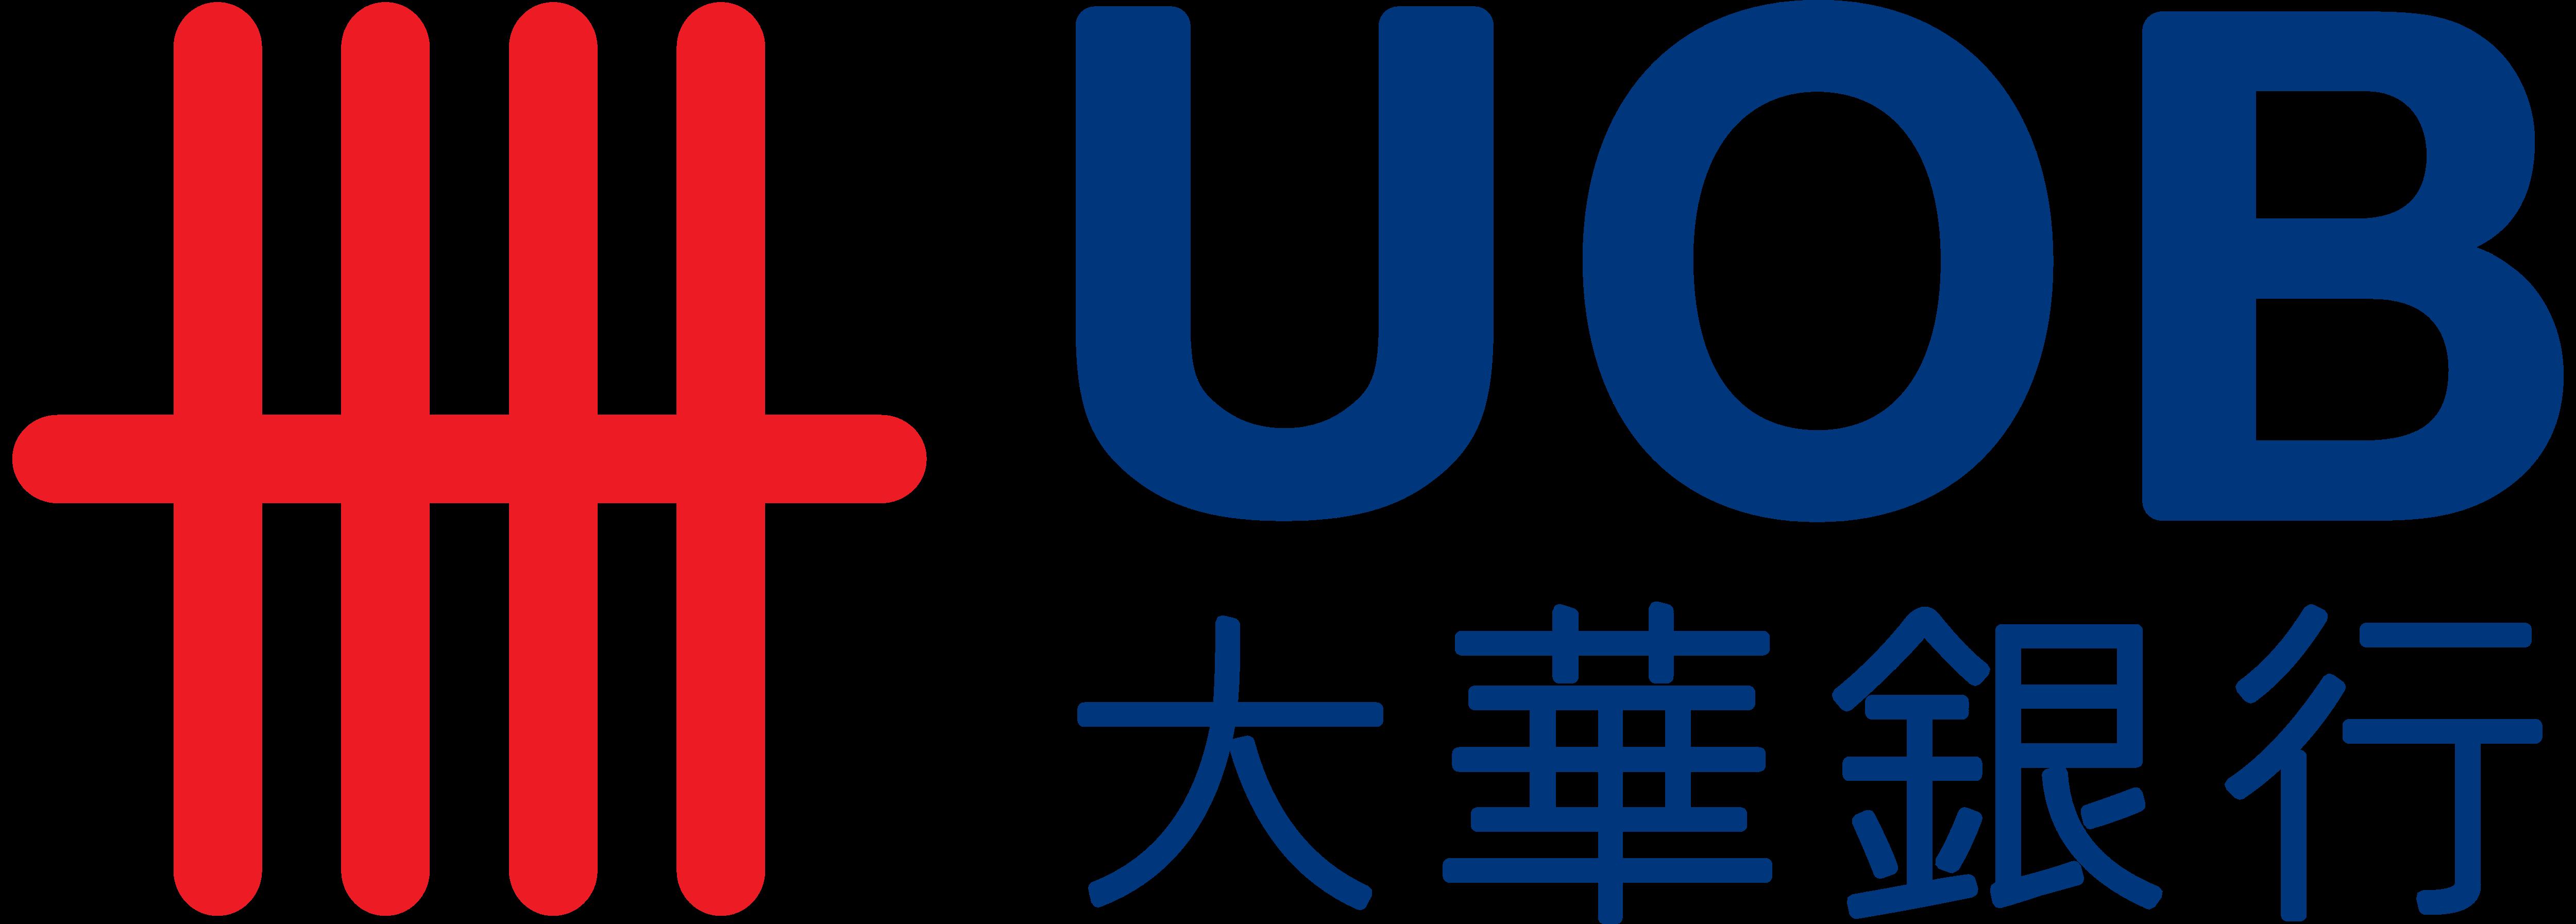 Uob logo clipart vector black and white library United Overseas Bank, UOB – Logos Download vector black and white library